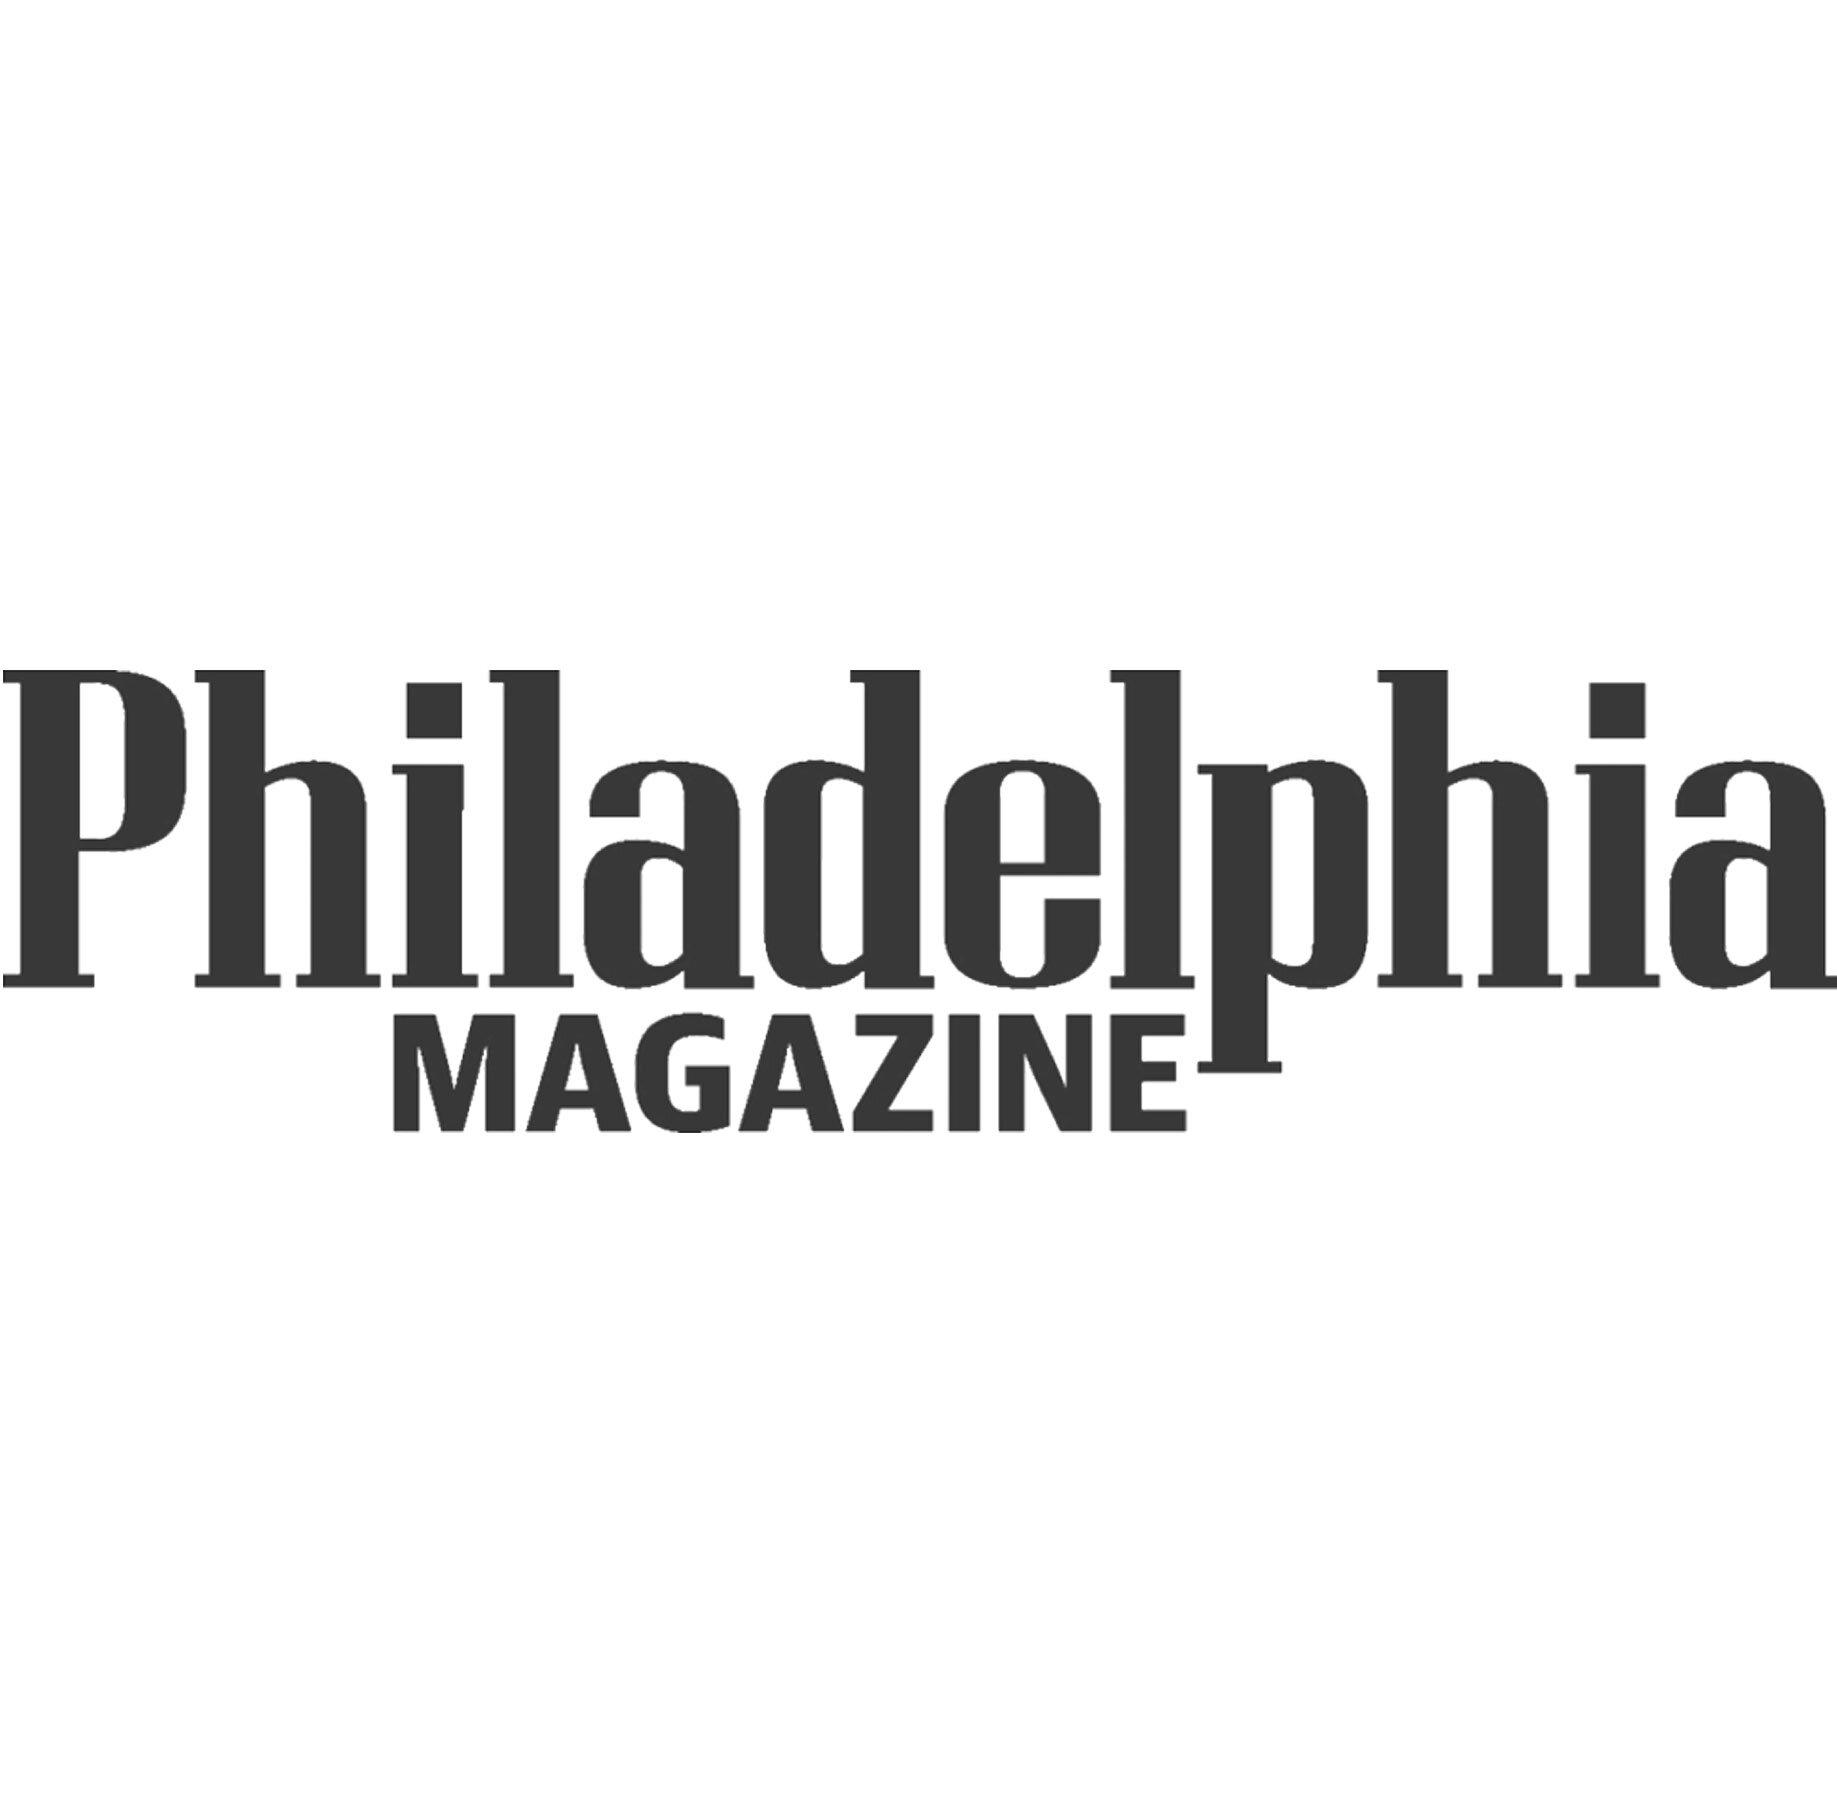 philadelphiamagazine.jpg